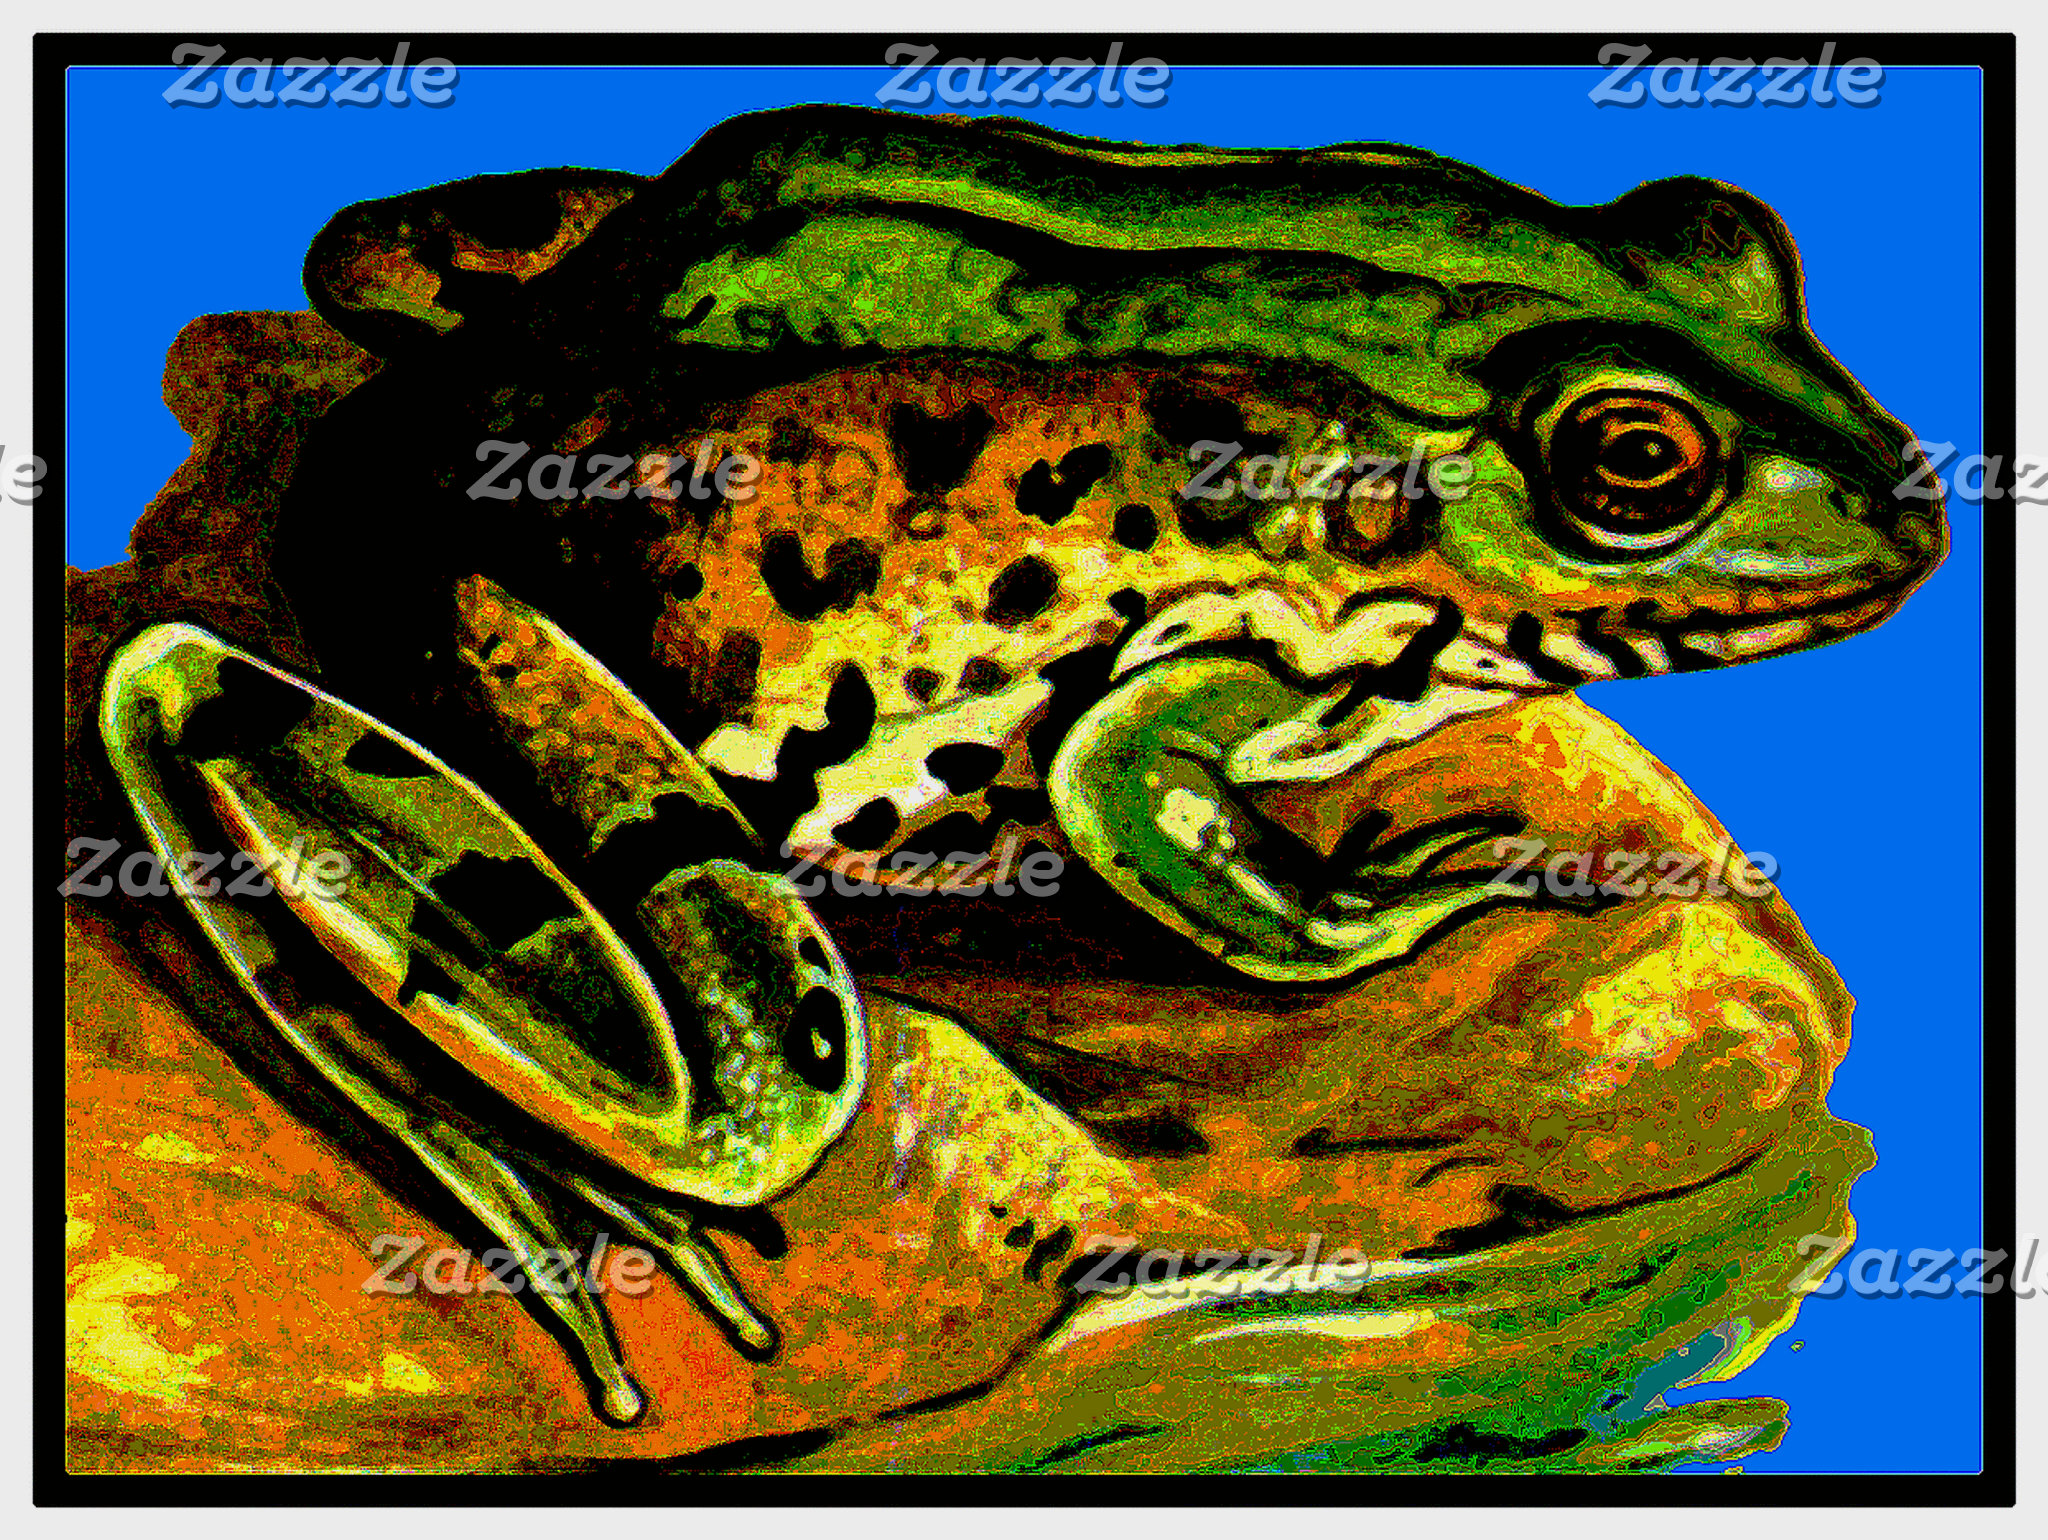 AMPHIBIANS-(FROGS,TOADS,SALAMANDERS,NEWTS